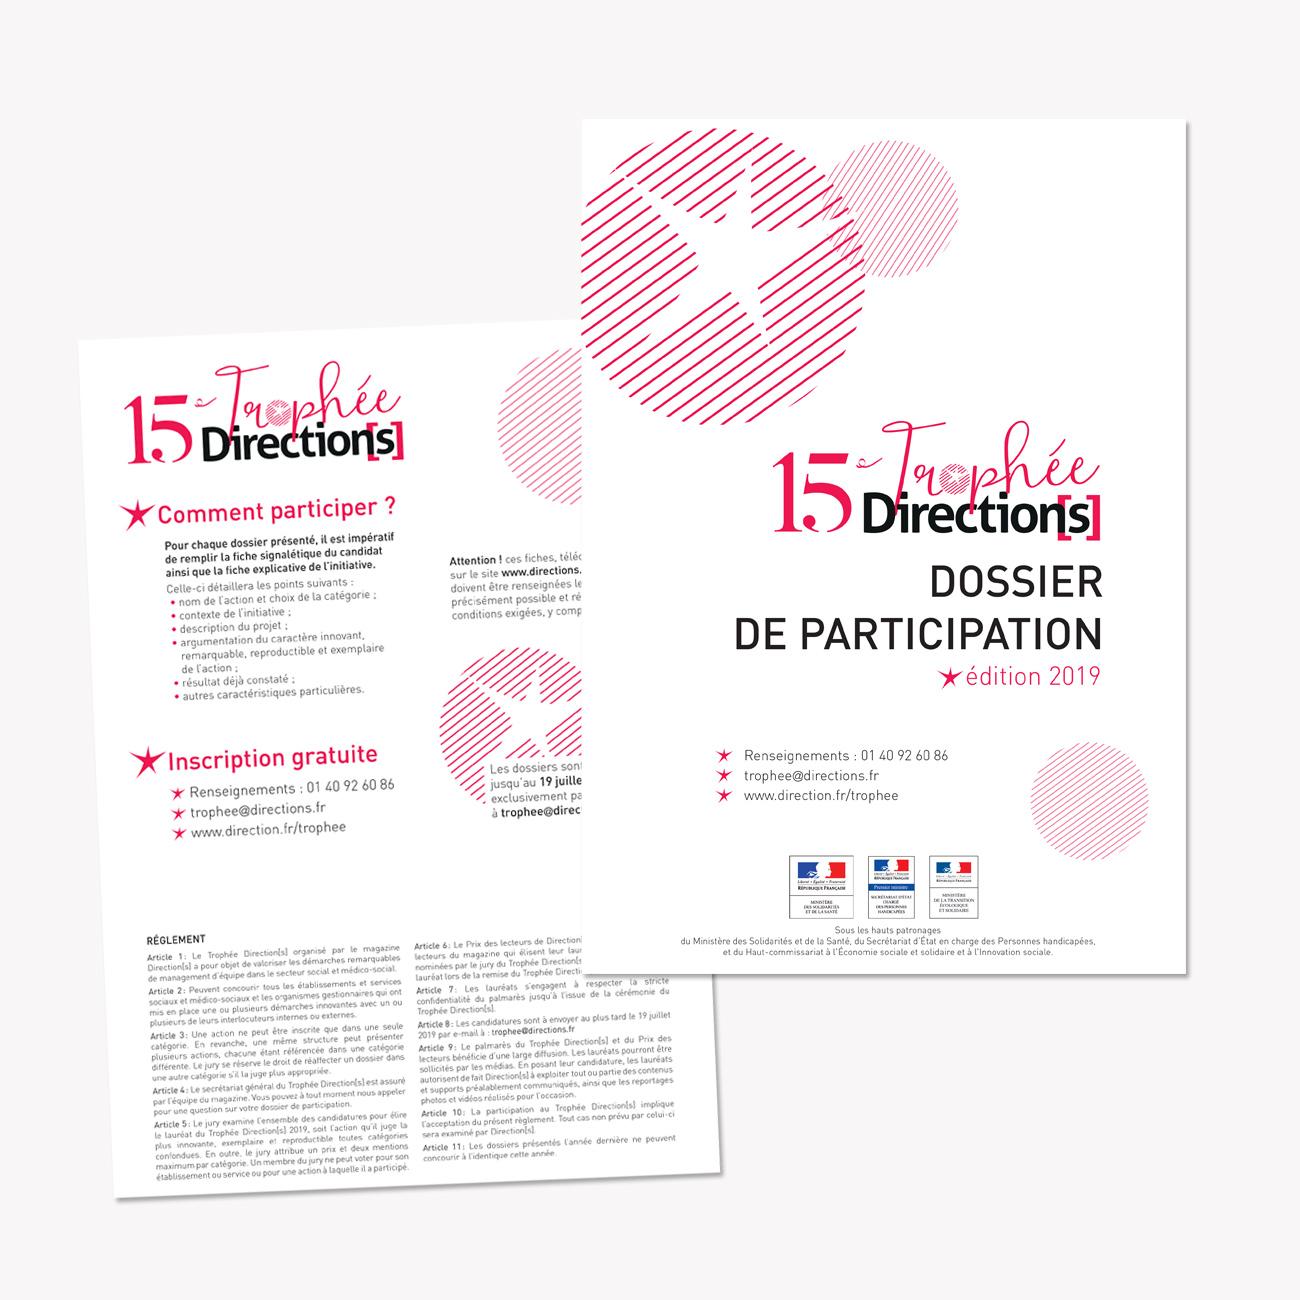 Dossier-participation-Trophee-directions